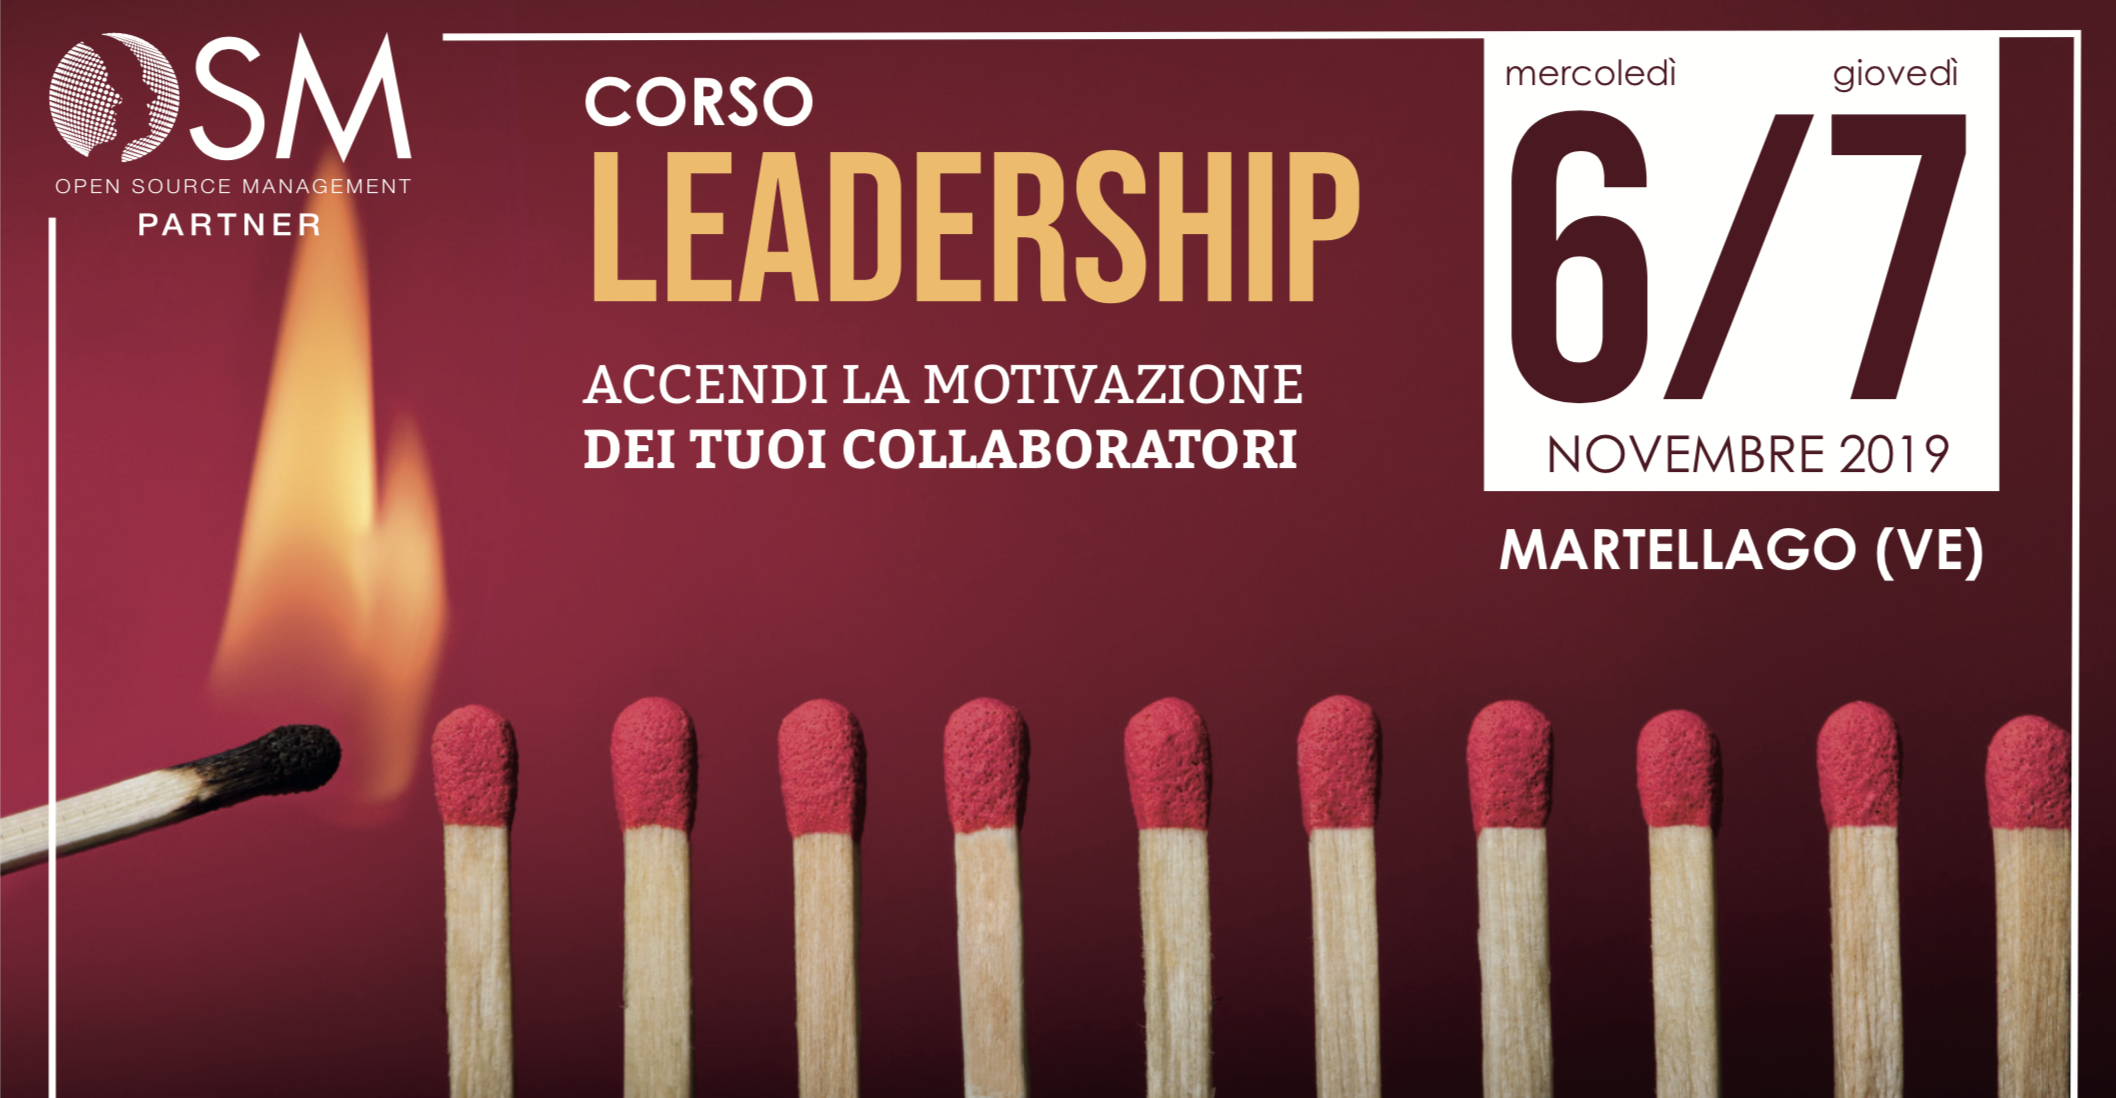 Corso Leadership Base - Martellago, 6 e 7 Novembre 2019